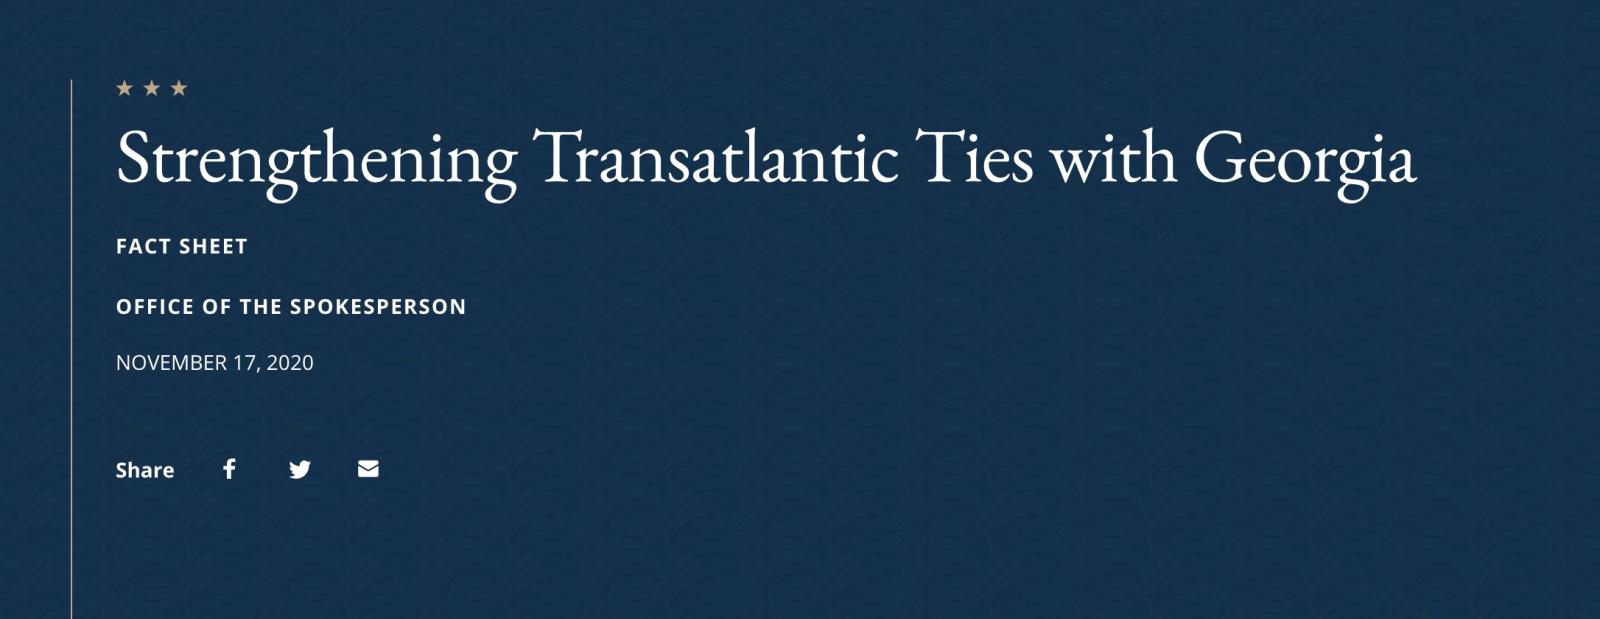 Department of State: U.S. Supports Georgia in Strengthening Transatlantic Ties